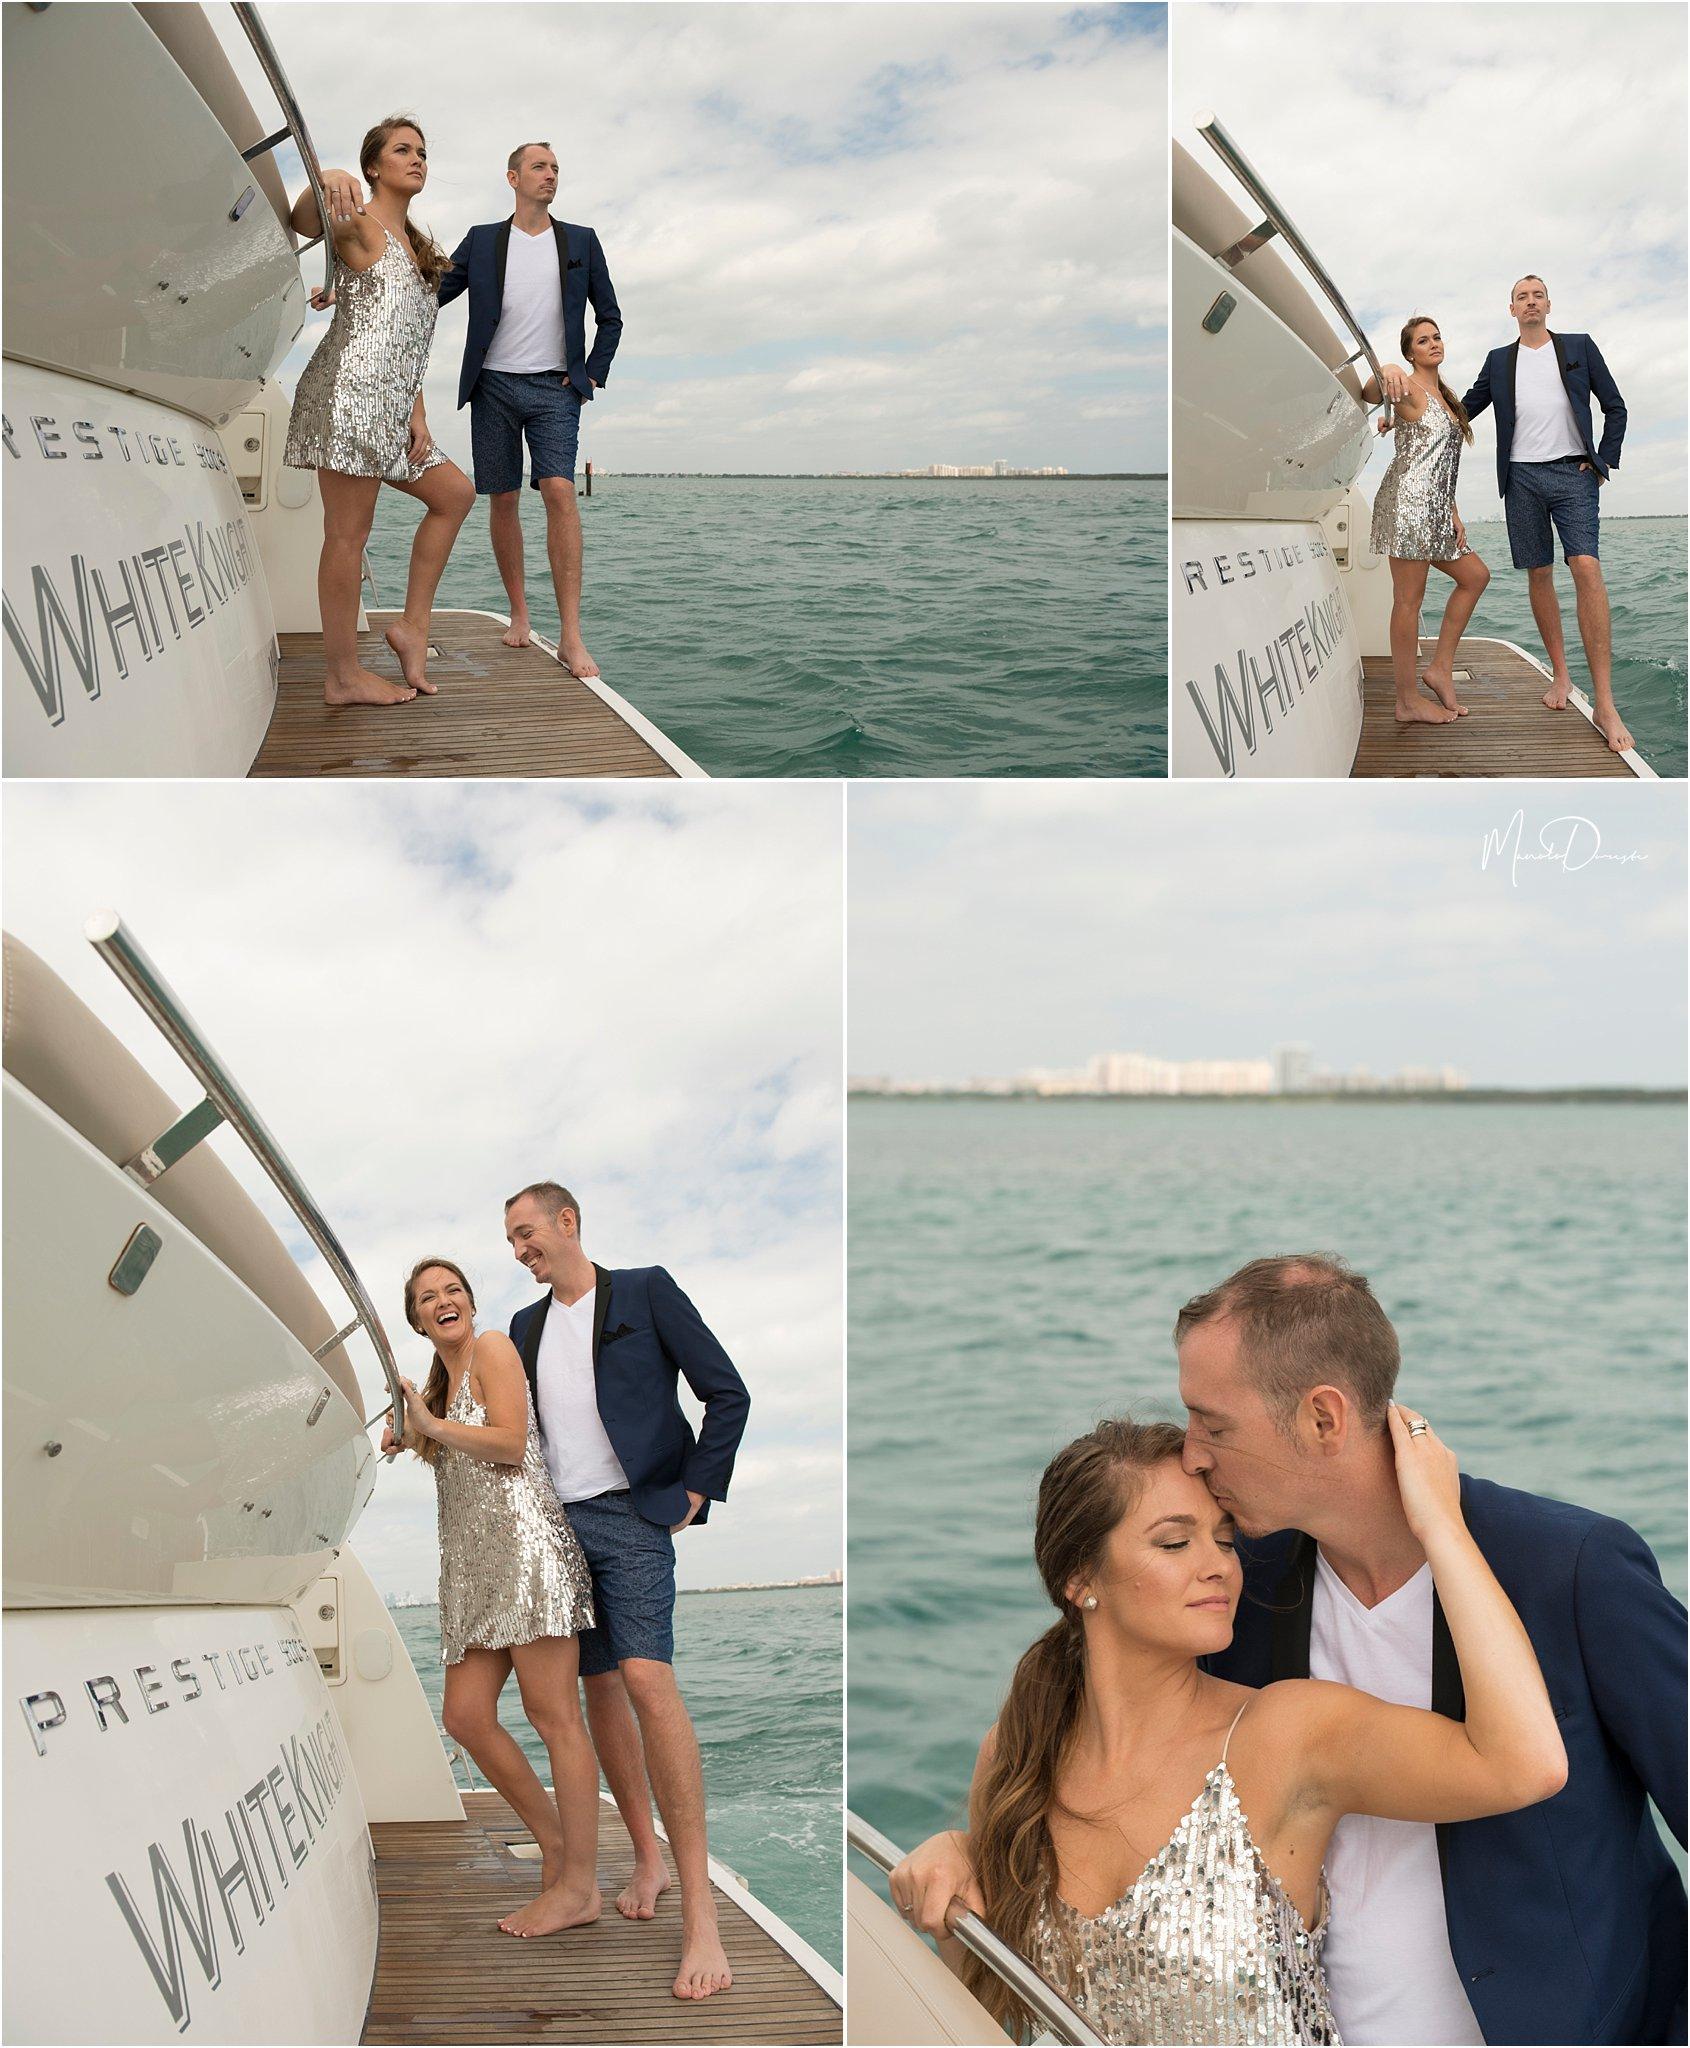 00906_ManoloDoreste_InFocusStudios_Wedding_Family_Photography_Miami_MiamiPhotographer.jpg